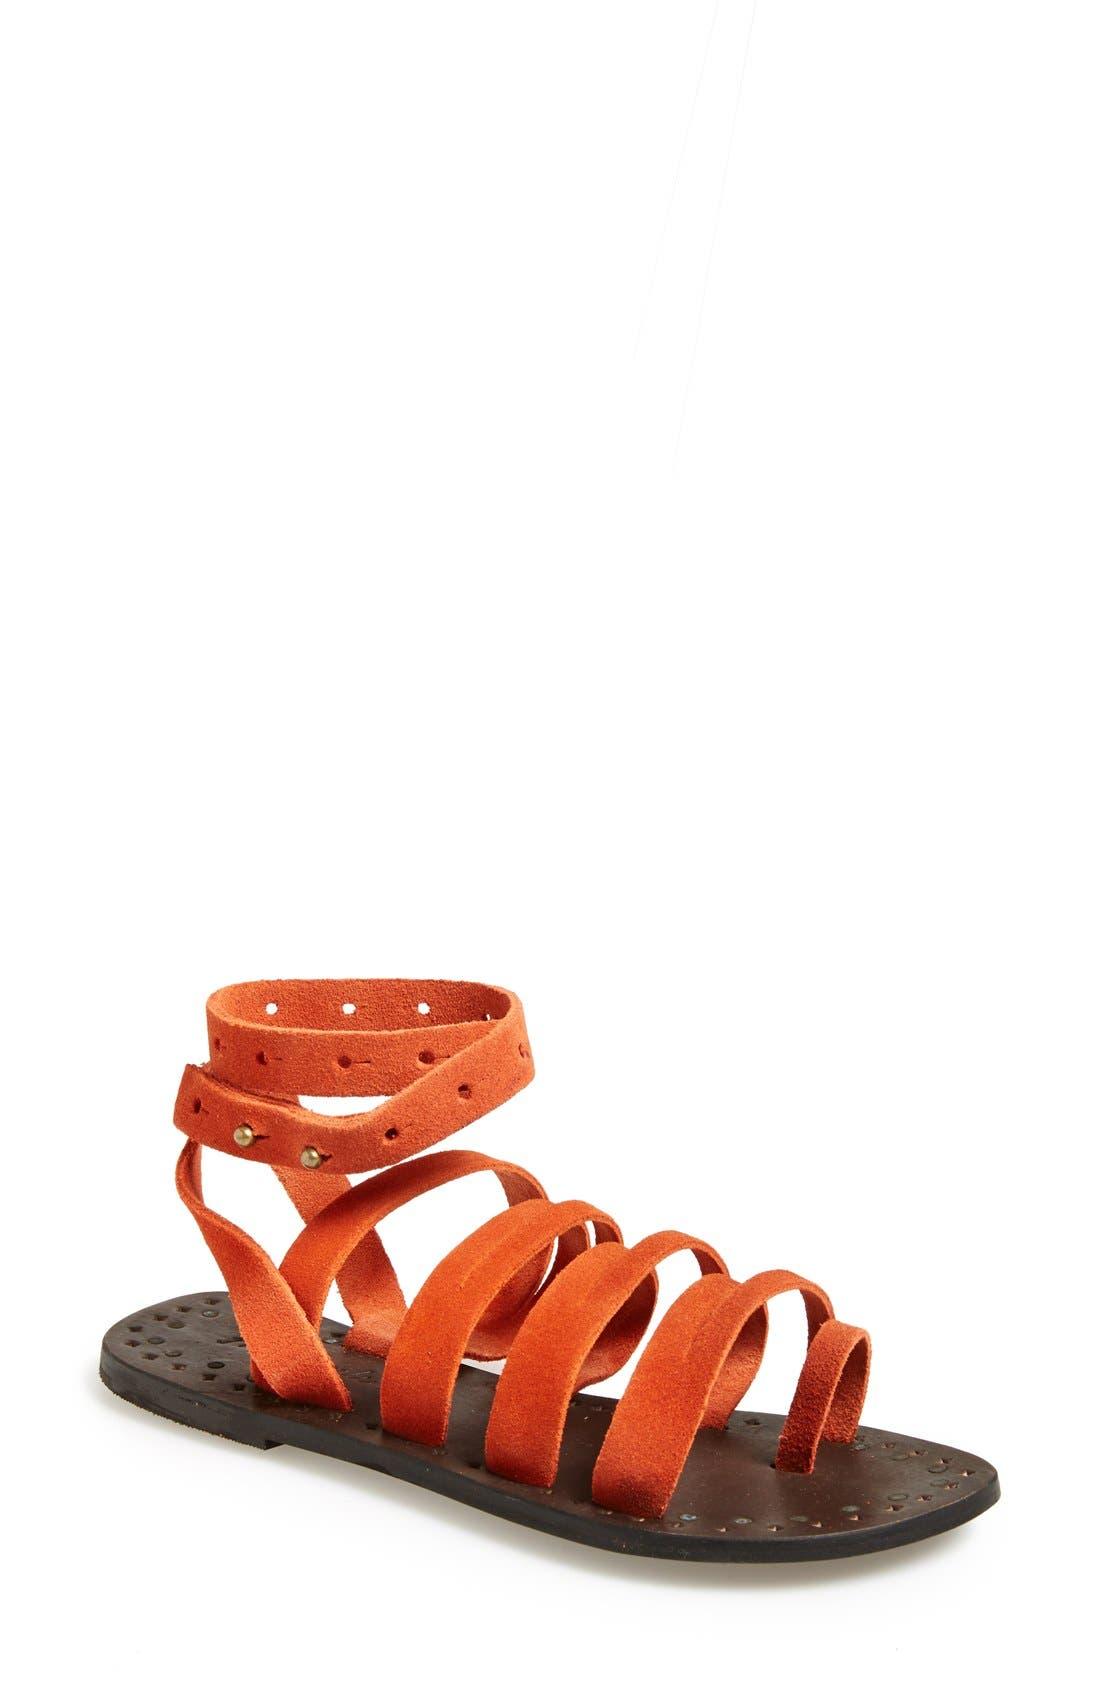 Alternate Image 1 Selected - Free People 'Sunever' Leather Gladiator Sandal (Women)